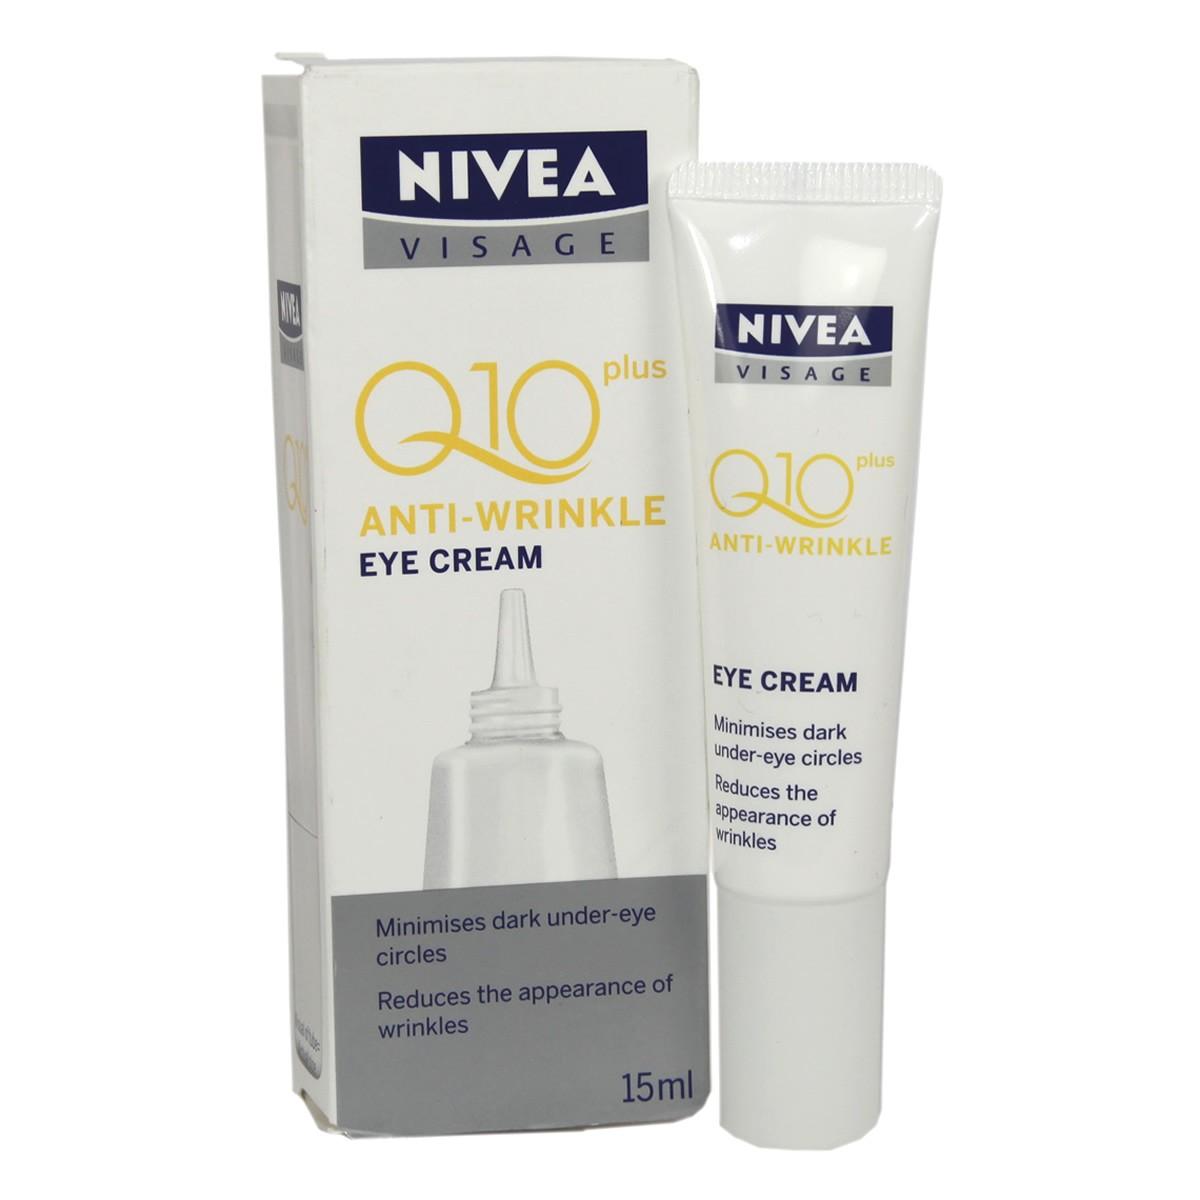 Nivea Visage Anti-Wrinkle Q10Plus Eye Cream